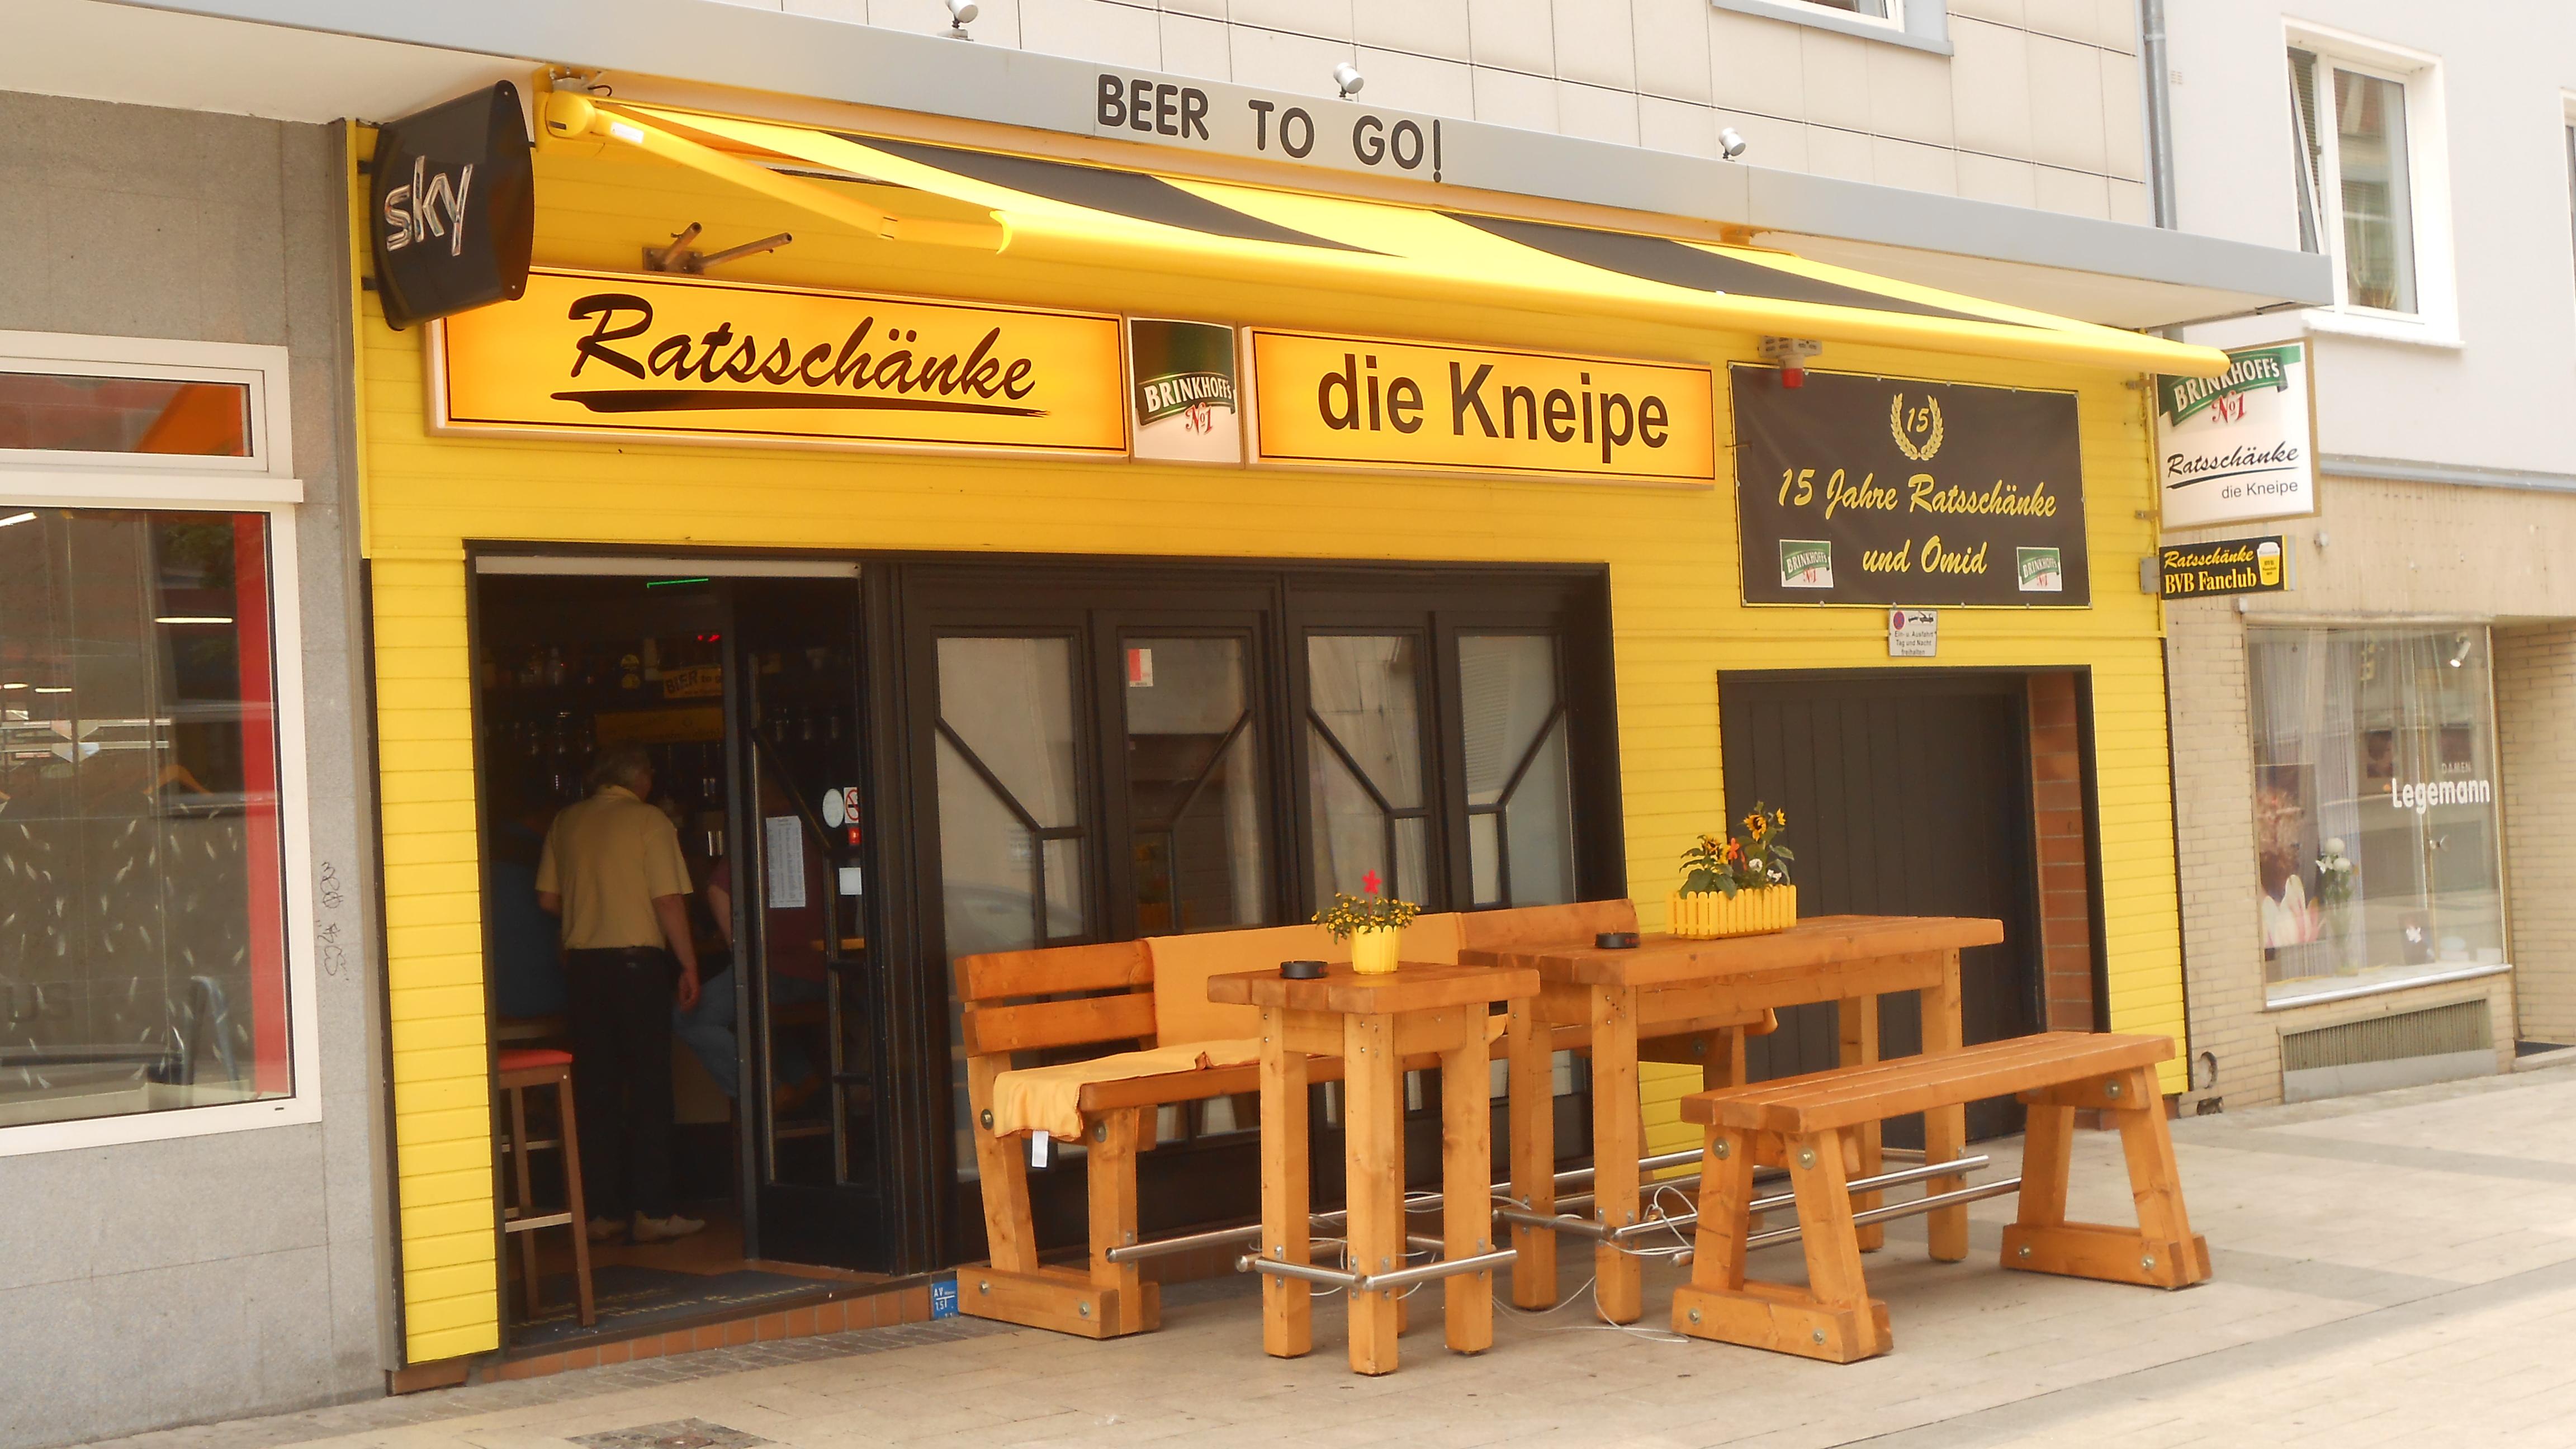 File:Ratsschänke Dortmund.jpg - Wikimedia Commons